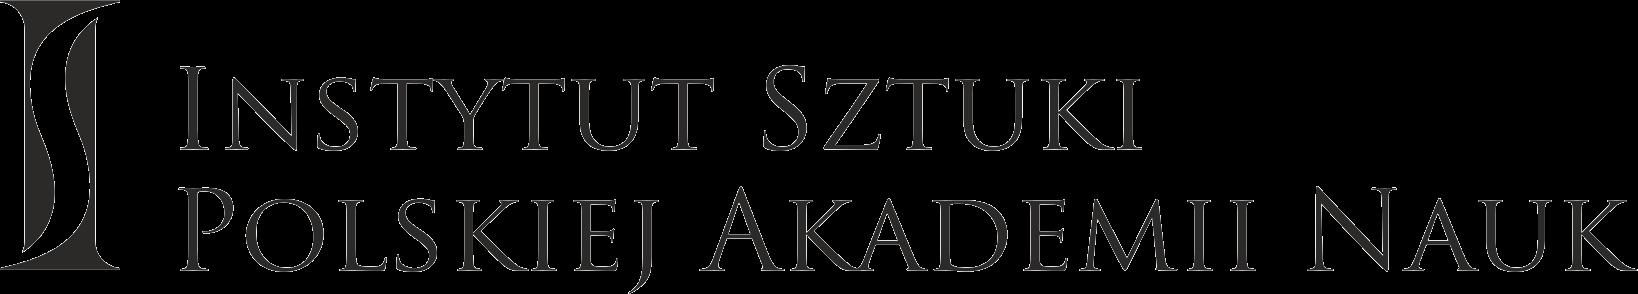 Instytut Sztuki Polskiej Akademii Nauk